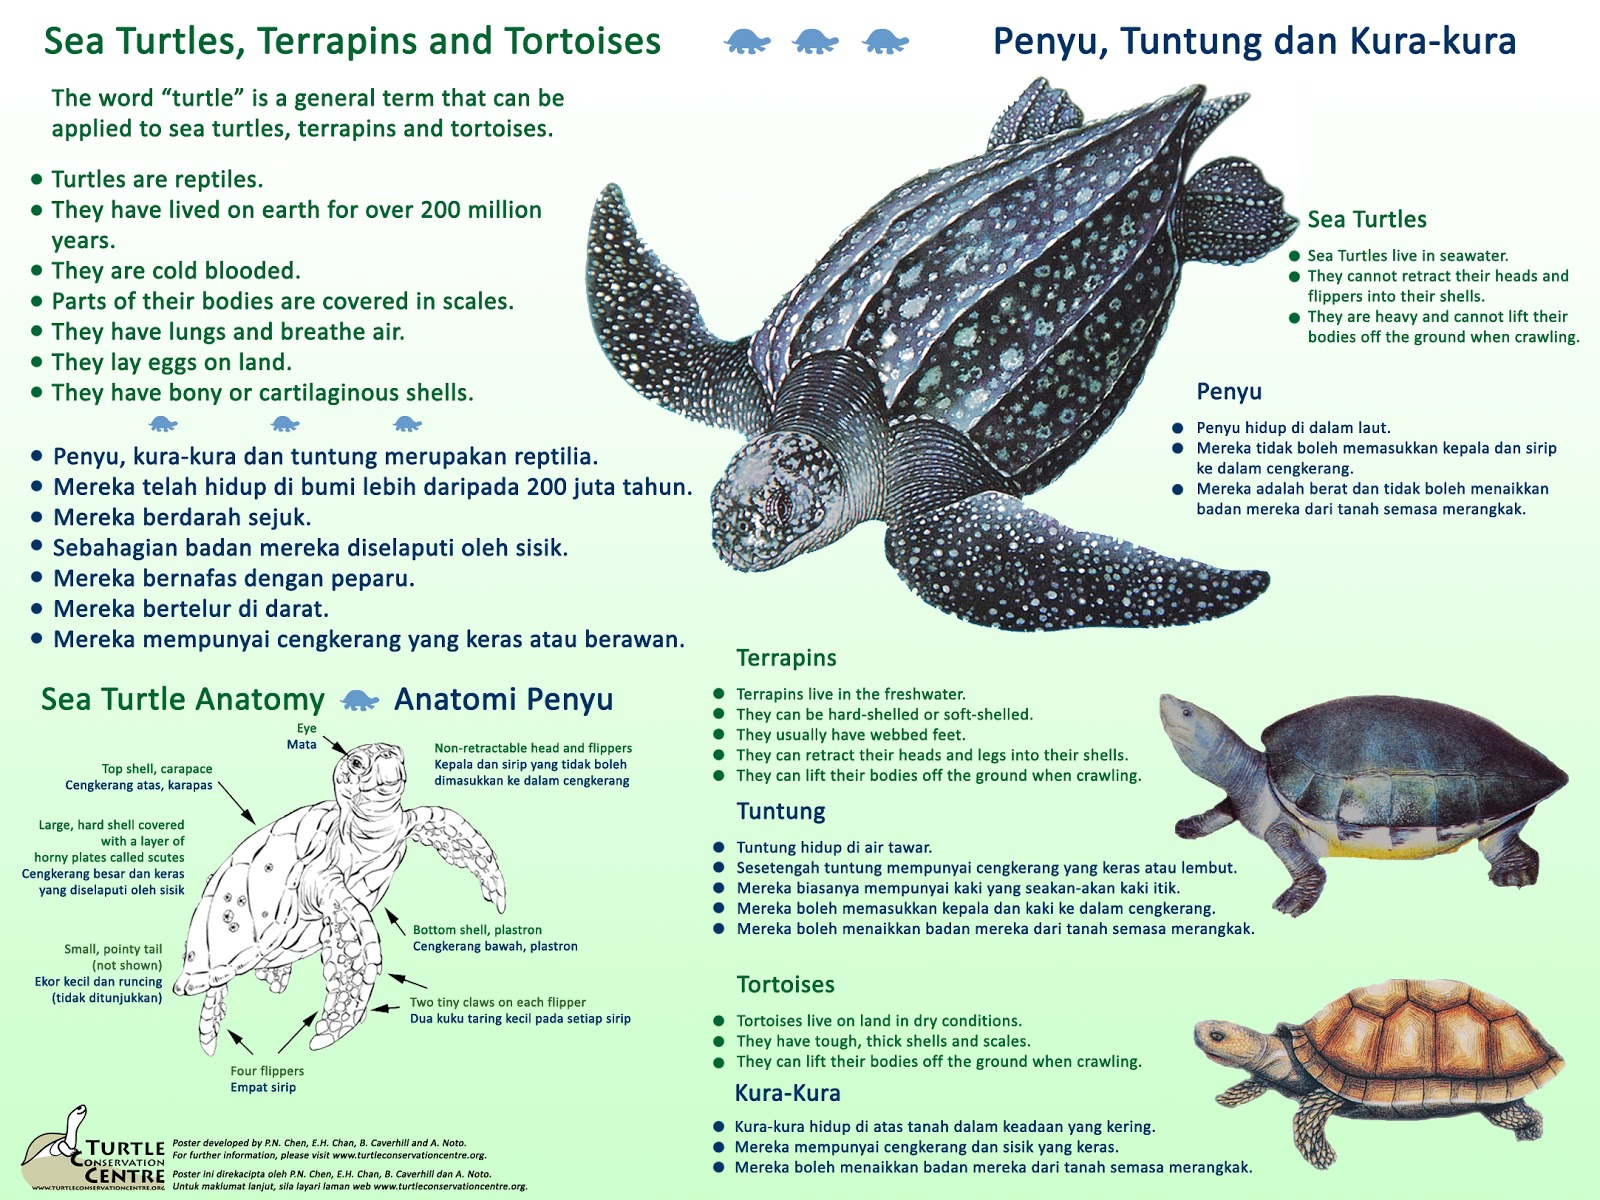 Redang Pelangi Resort Introduction To Turtles Sea Turtles Terrapins And Tortoises